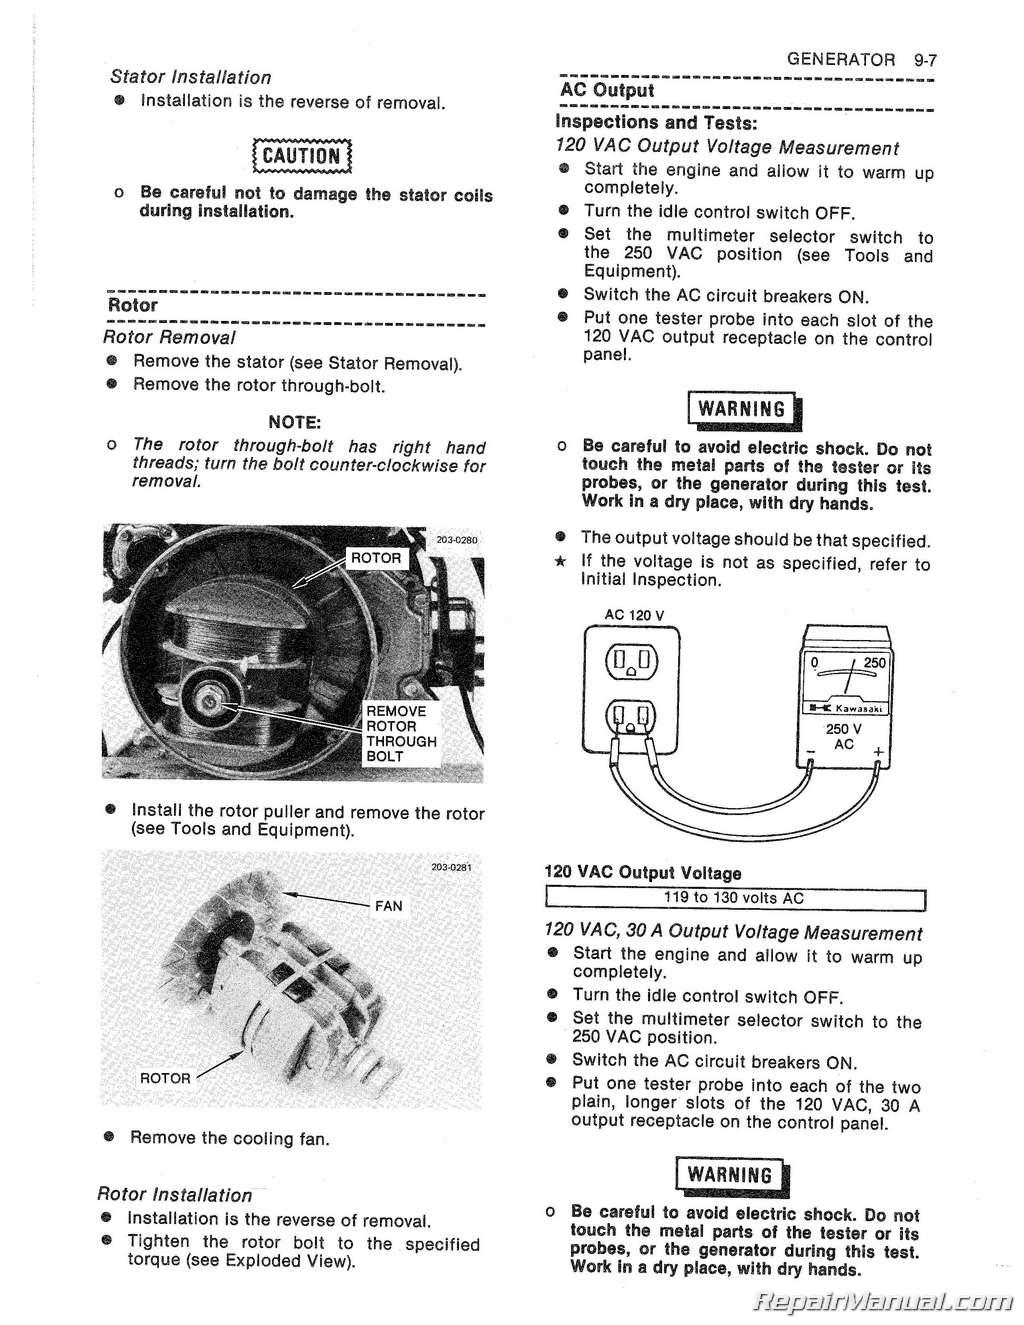 hight resolution of kawasaki generator wiring diagram wiring diagram paper kawasaki generator wiring diagram